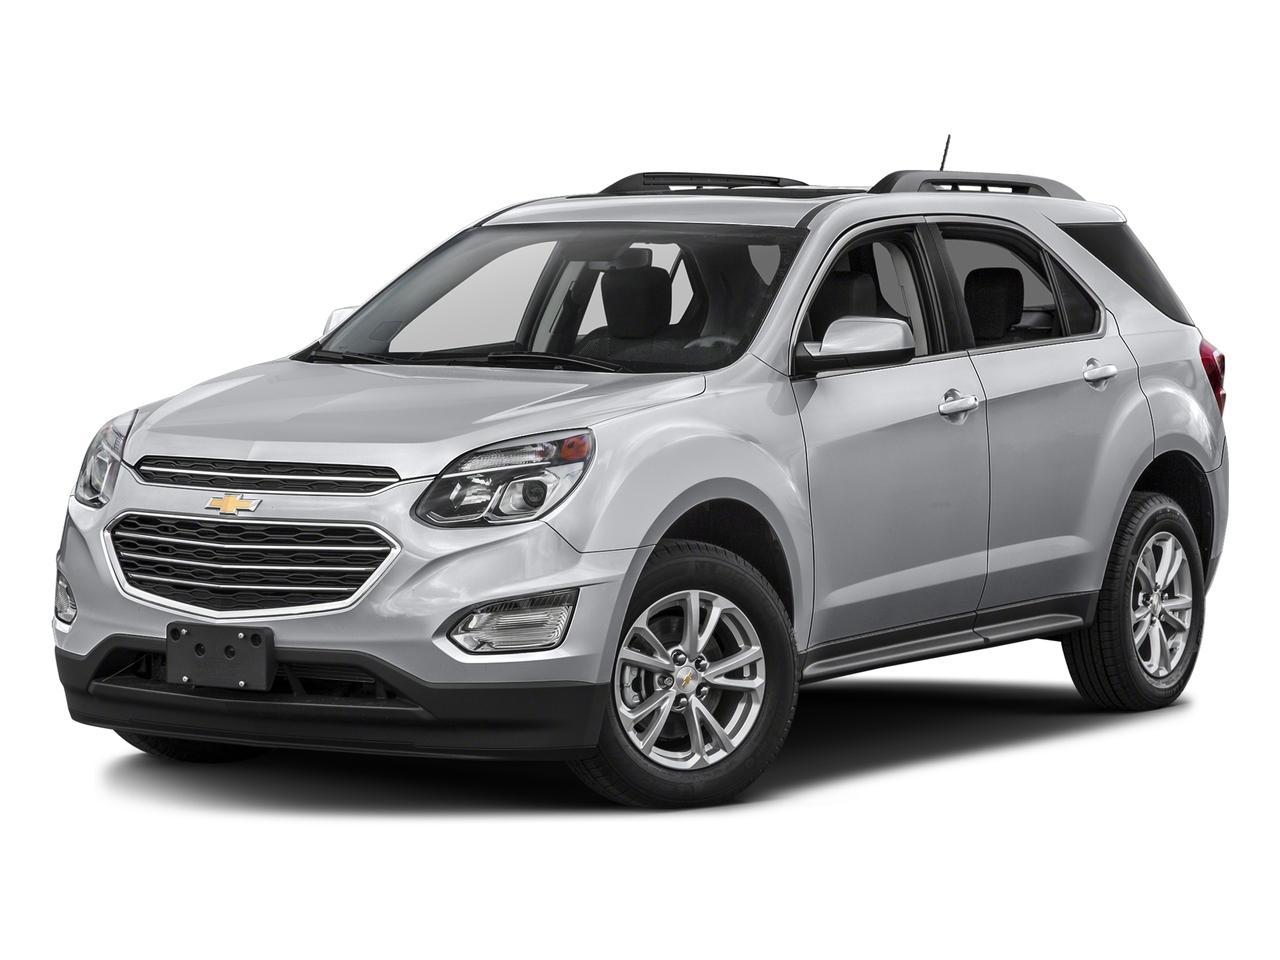 2016 Chevrolet Equinox Vehicle Photo in San Antonio, TX 78257